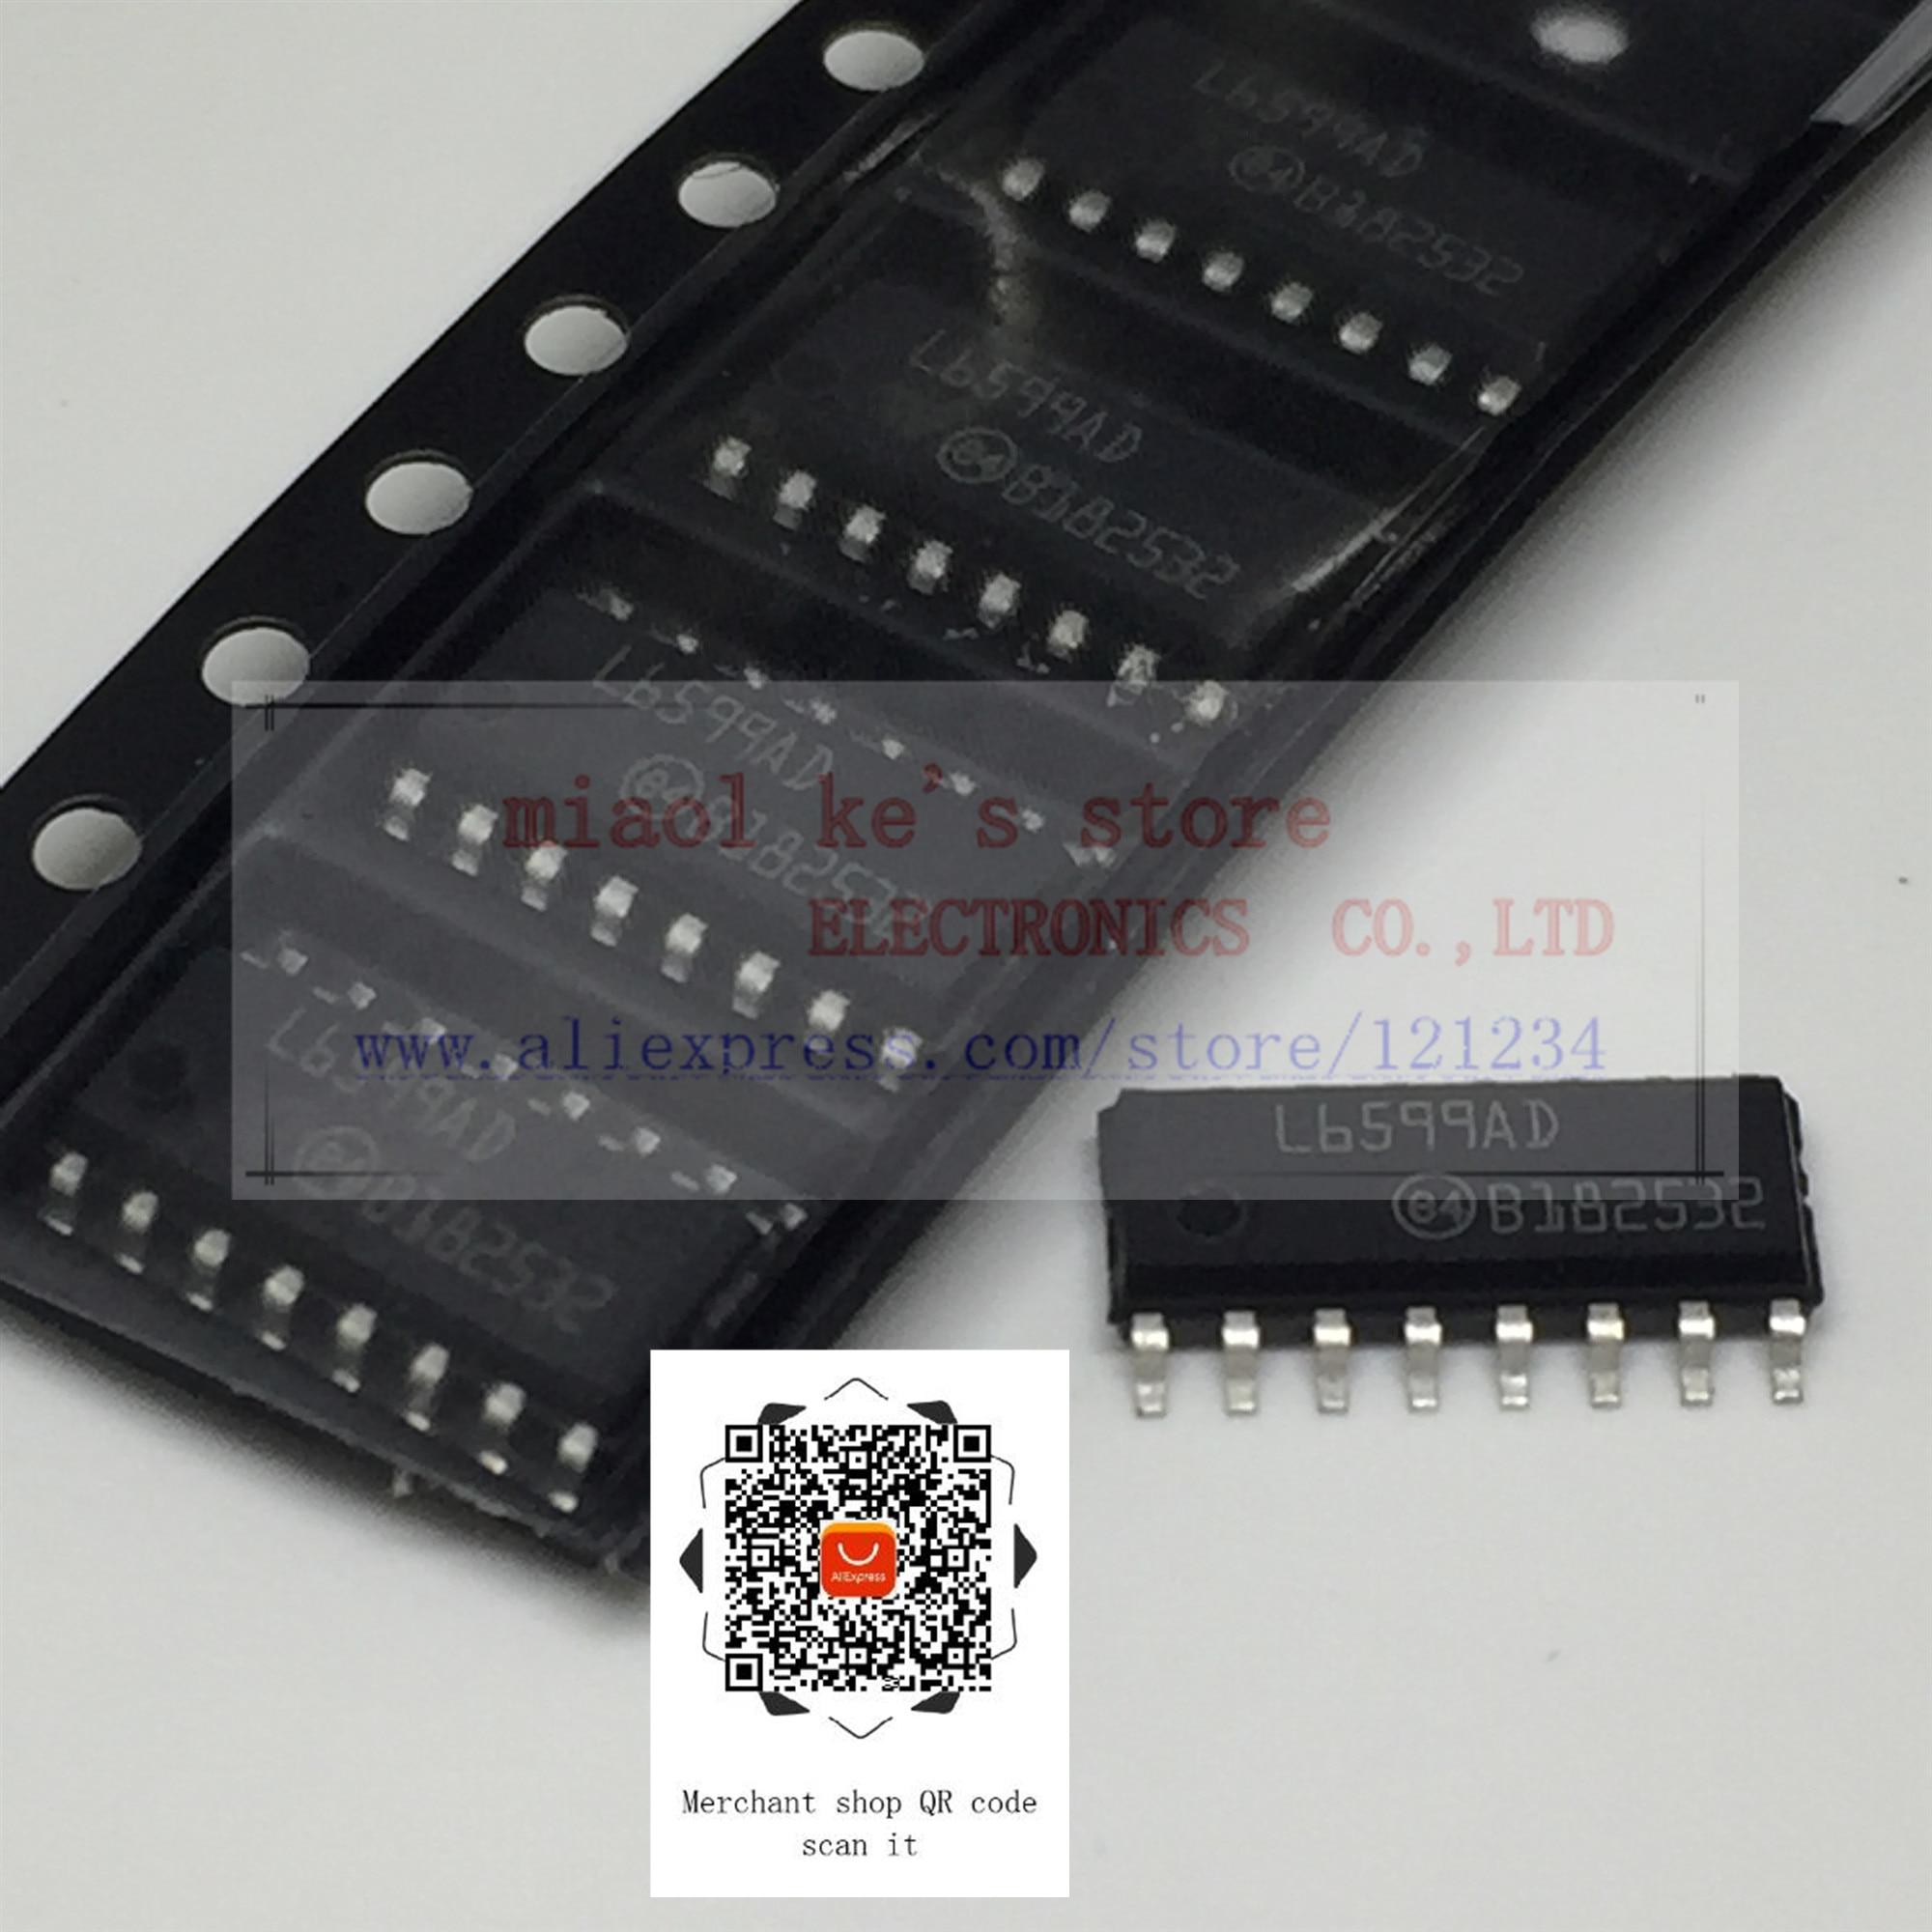 [ 5pcs/1lot or 10pcs/1lot ]100%New original; L6599ADTR L6599AD L6599A 6599AD 6599 - IC RESONANT CONVRTR CTRLR 16SOIC